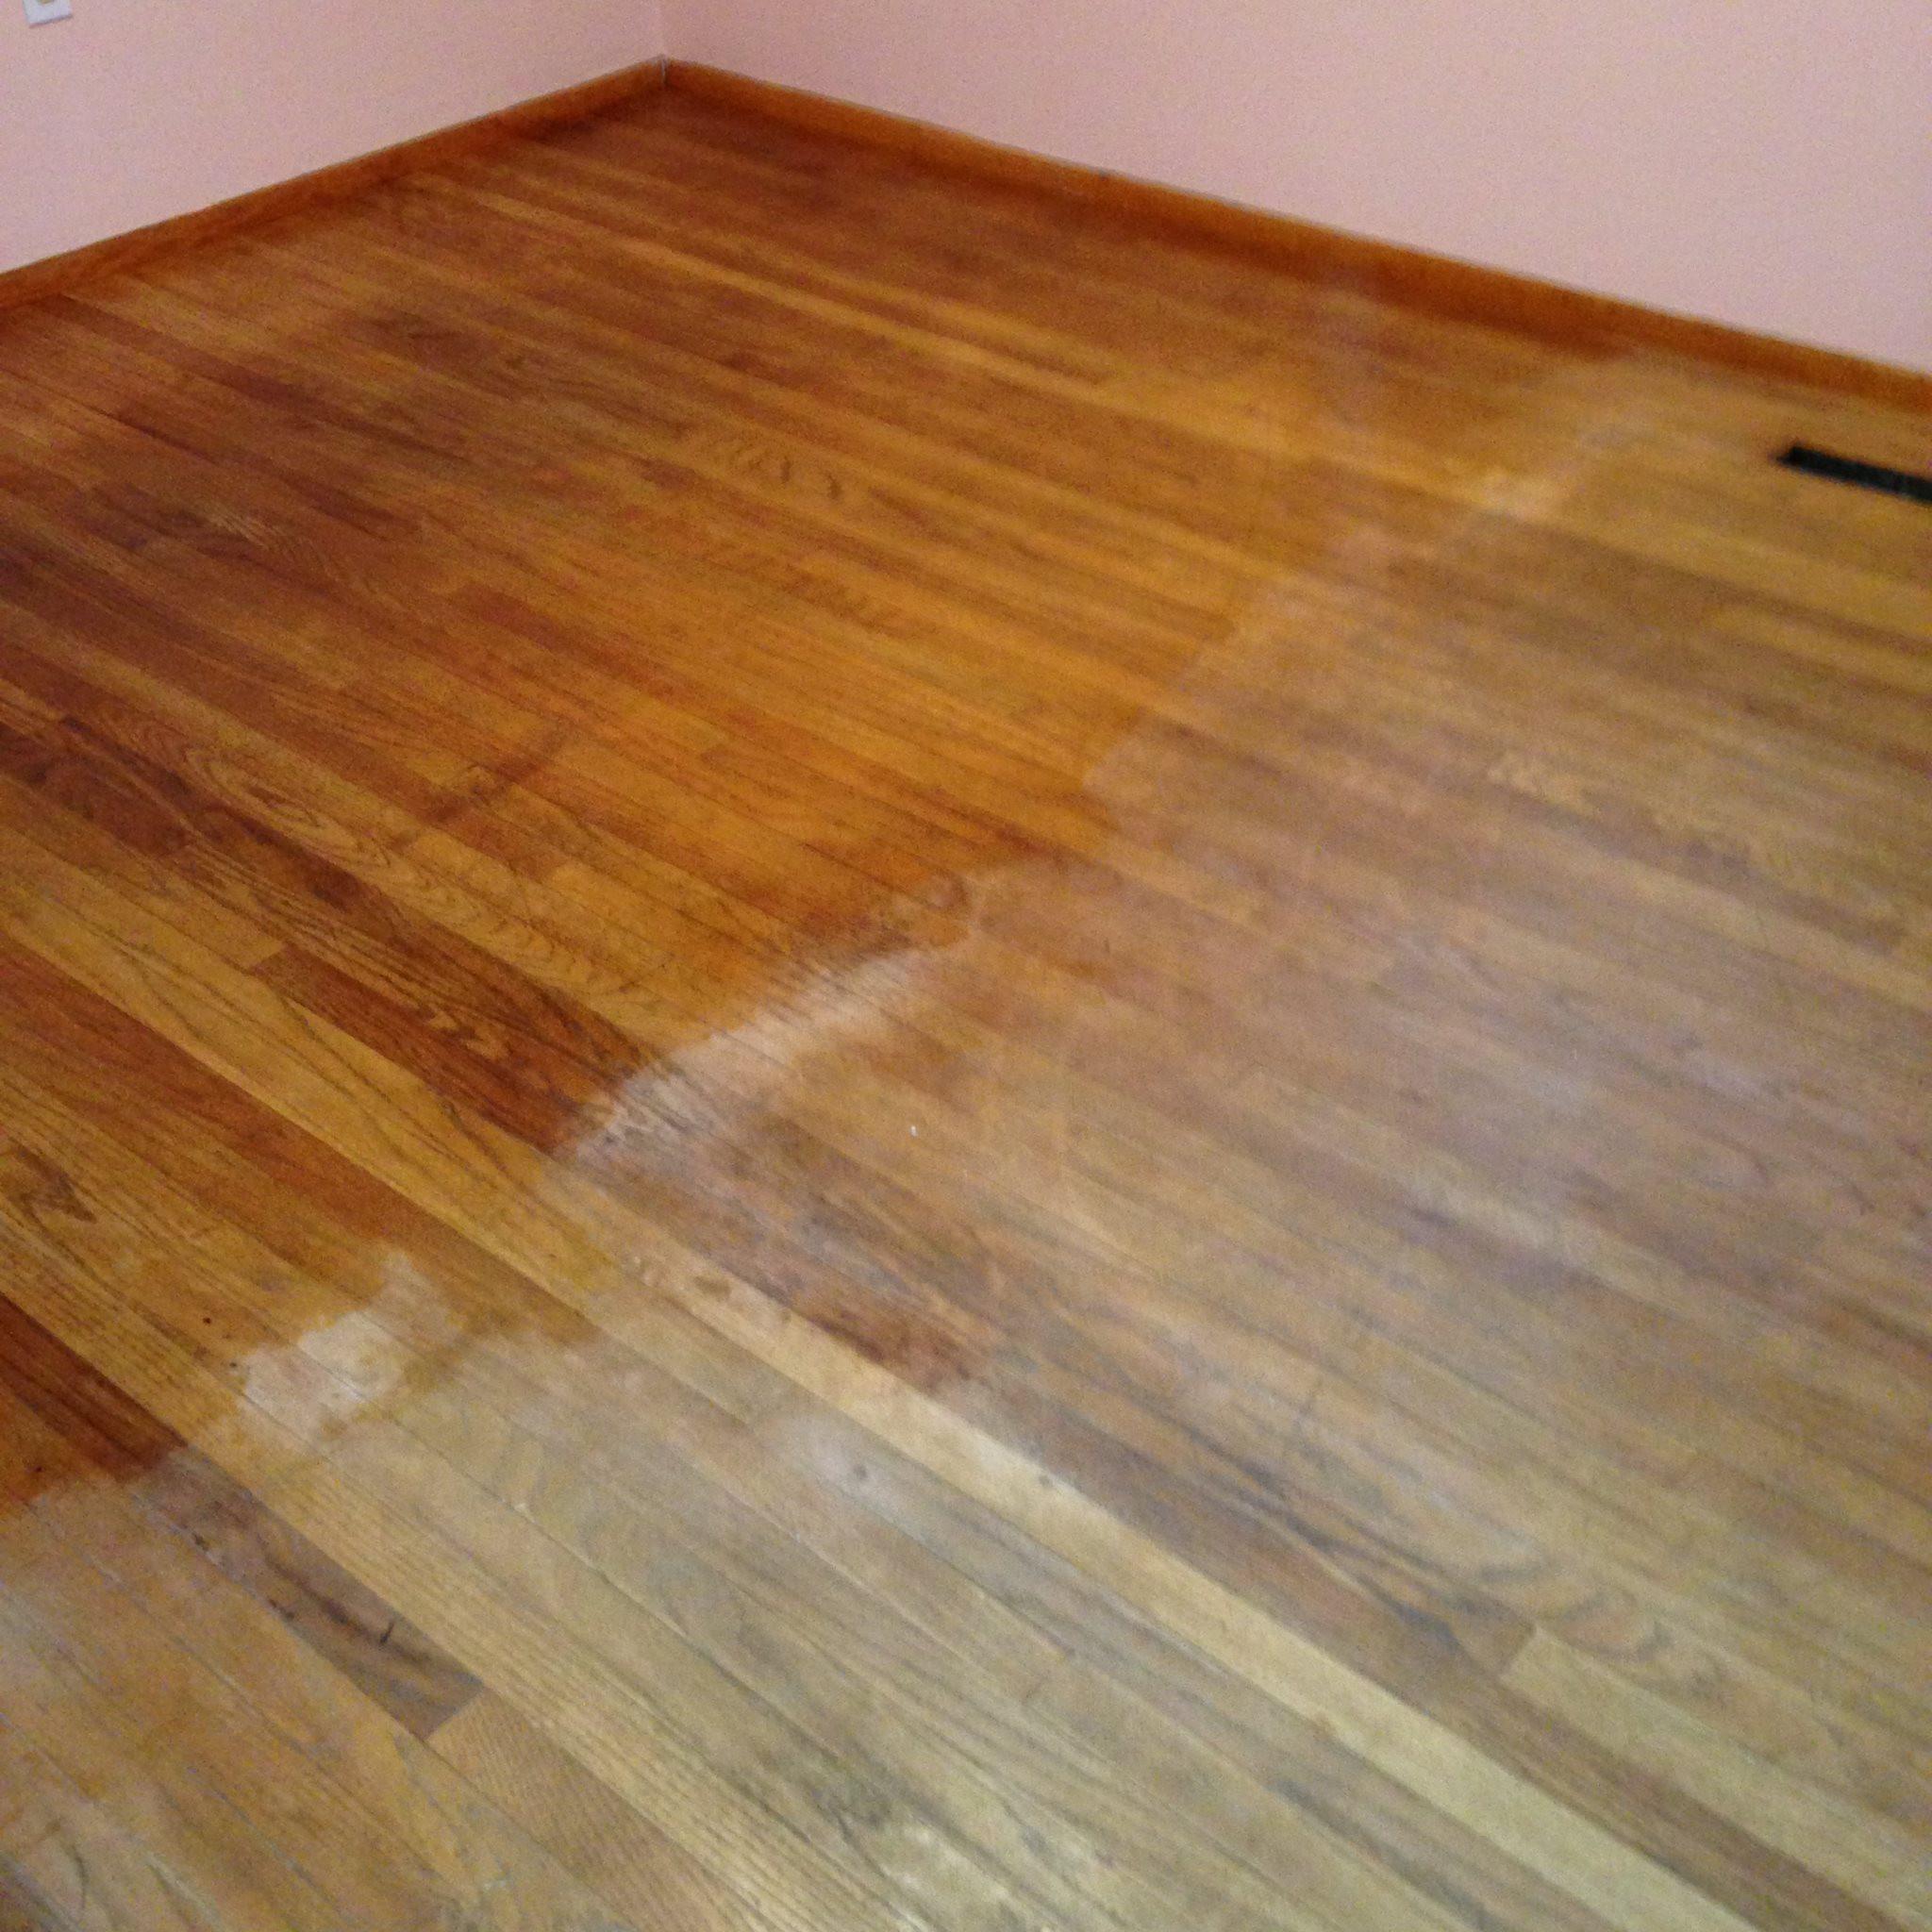 Hardwood Floor Cleaner and Restorer Of 15 Wood Floor Hacks Every Homeowner Needs to Know Regarding Wood Floor Hacks 15